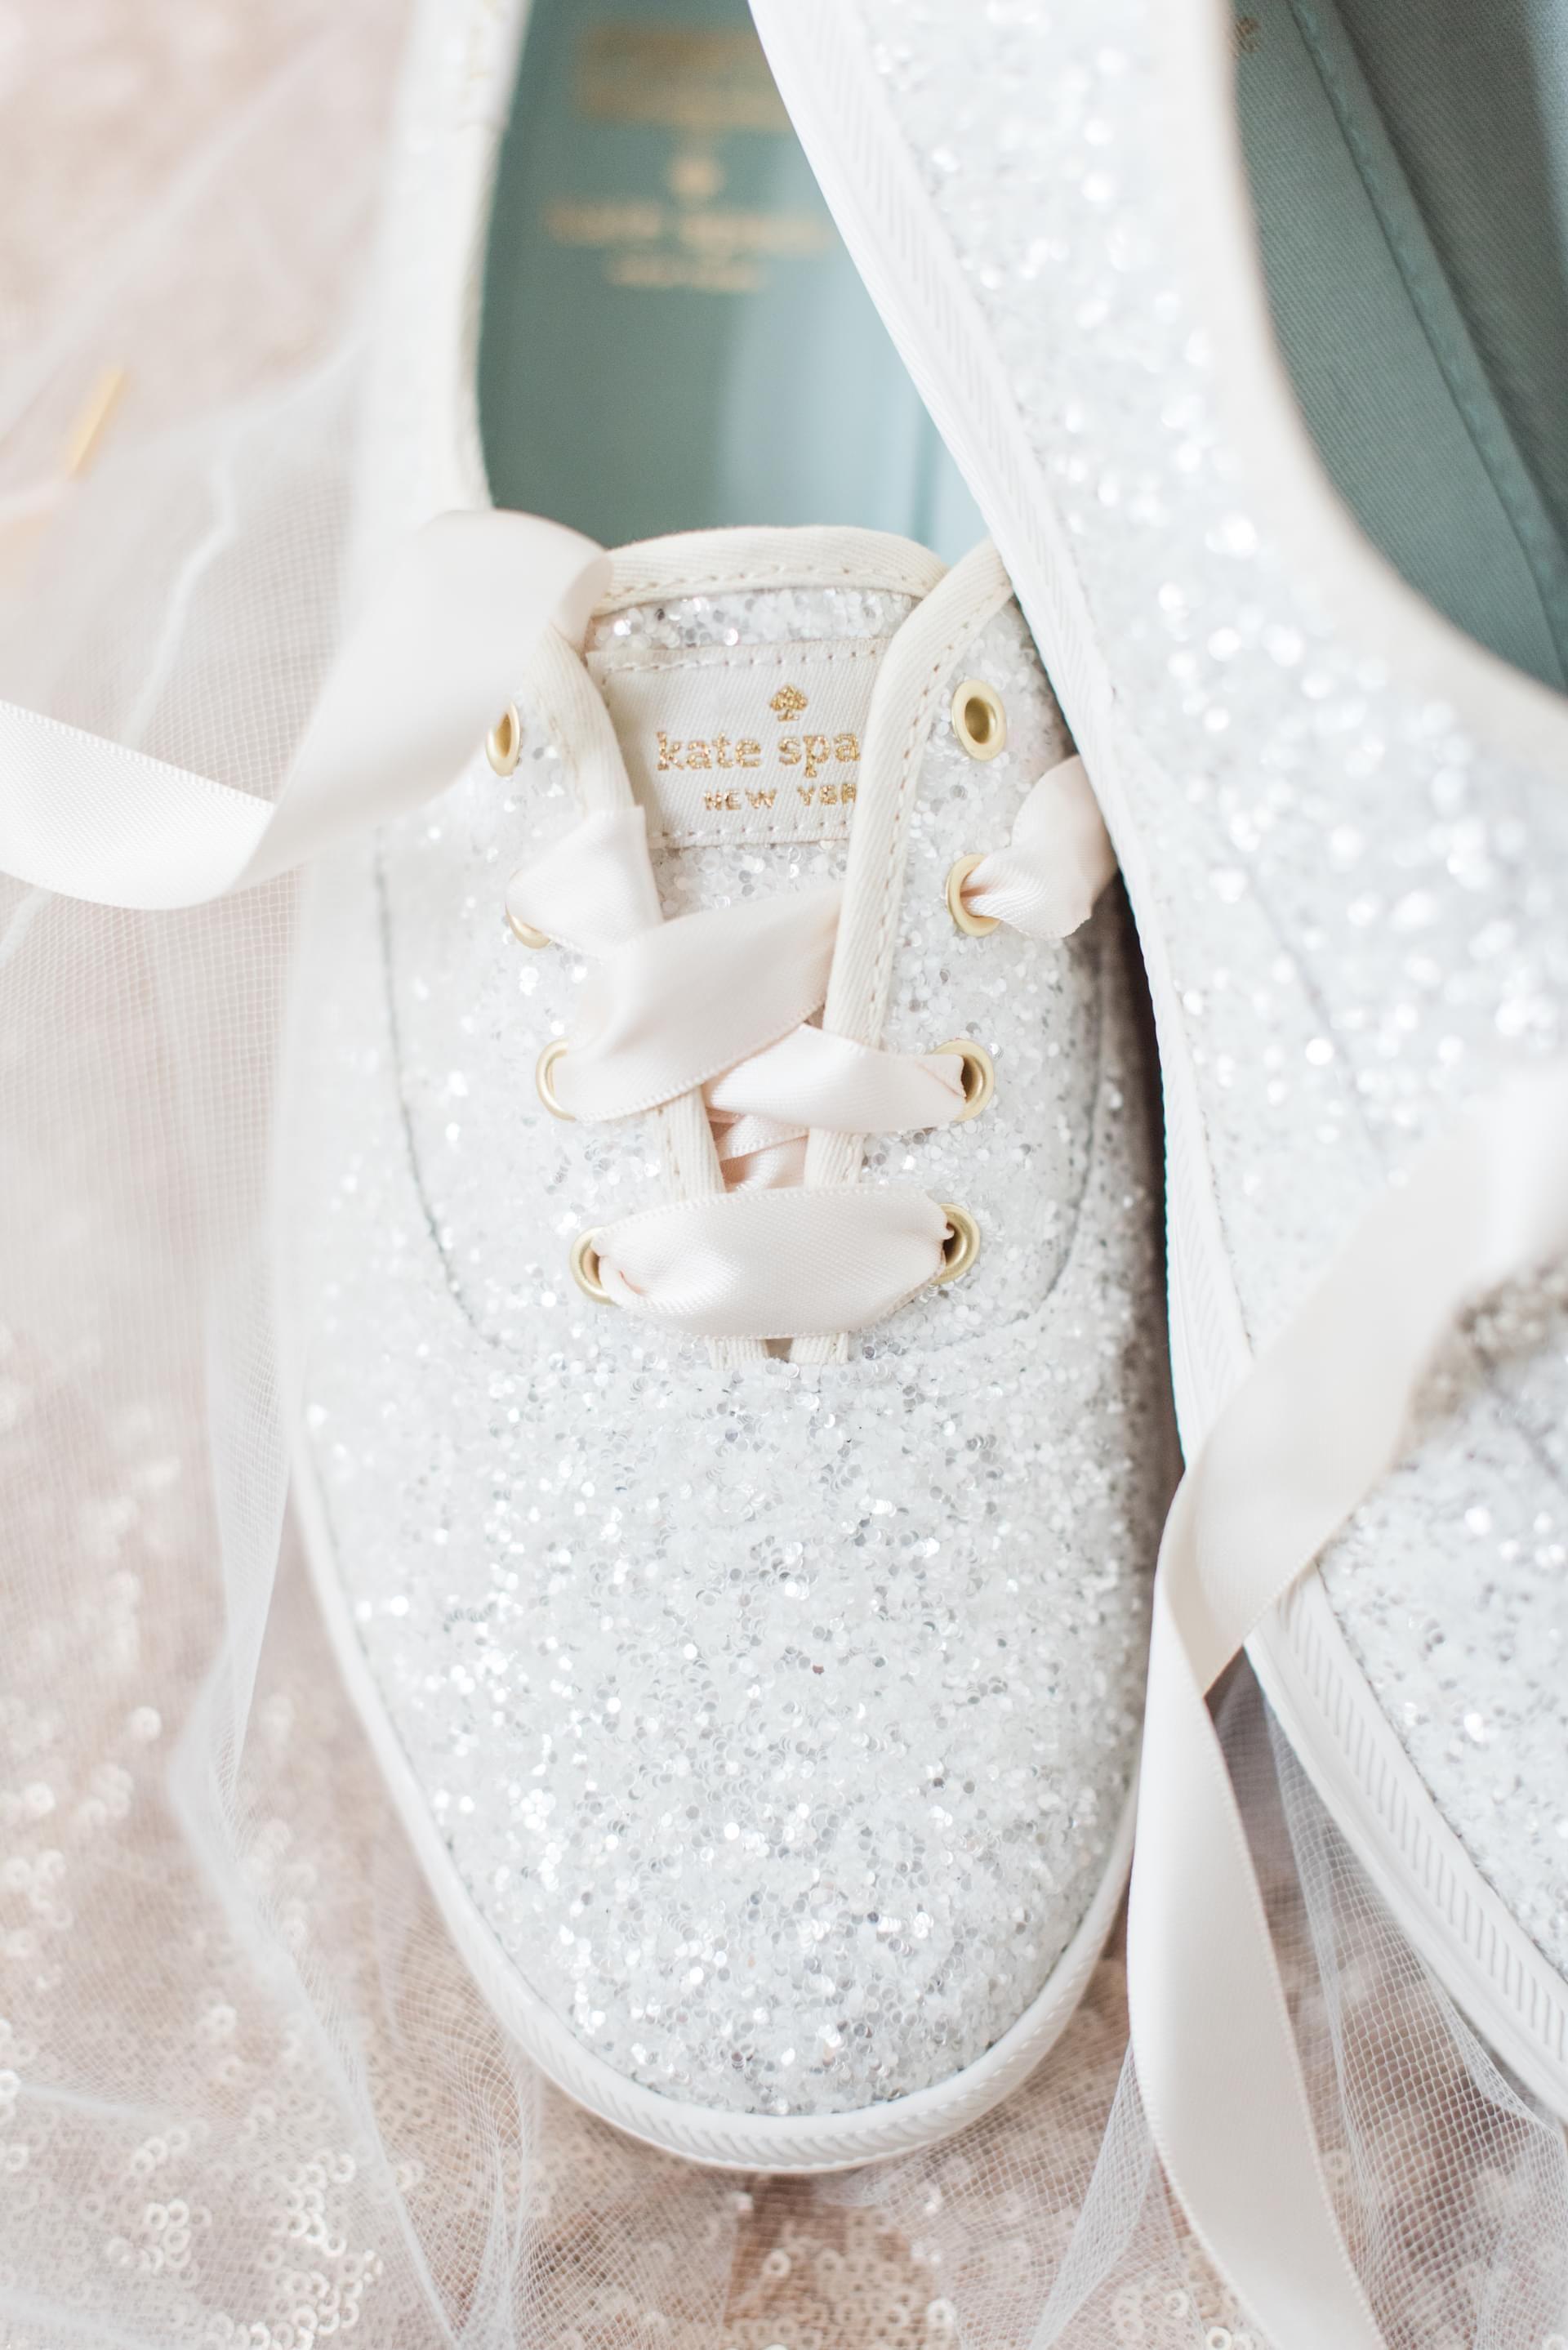 Tênis De Noiva Por Kate Spade Noivadetenis Weddingshoes Katespade